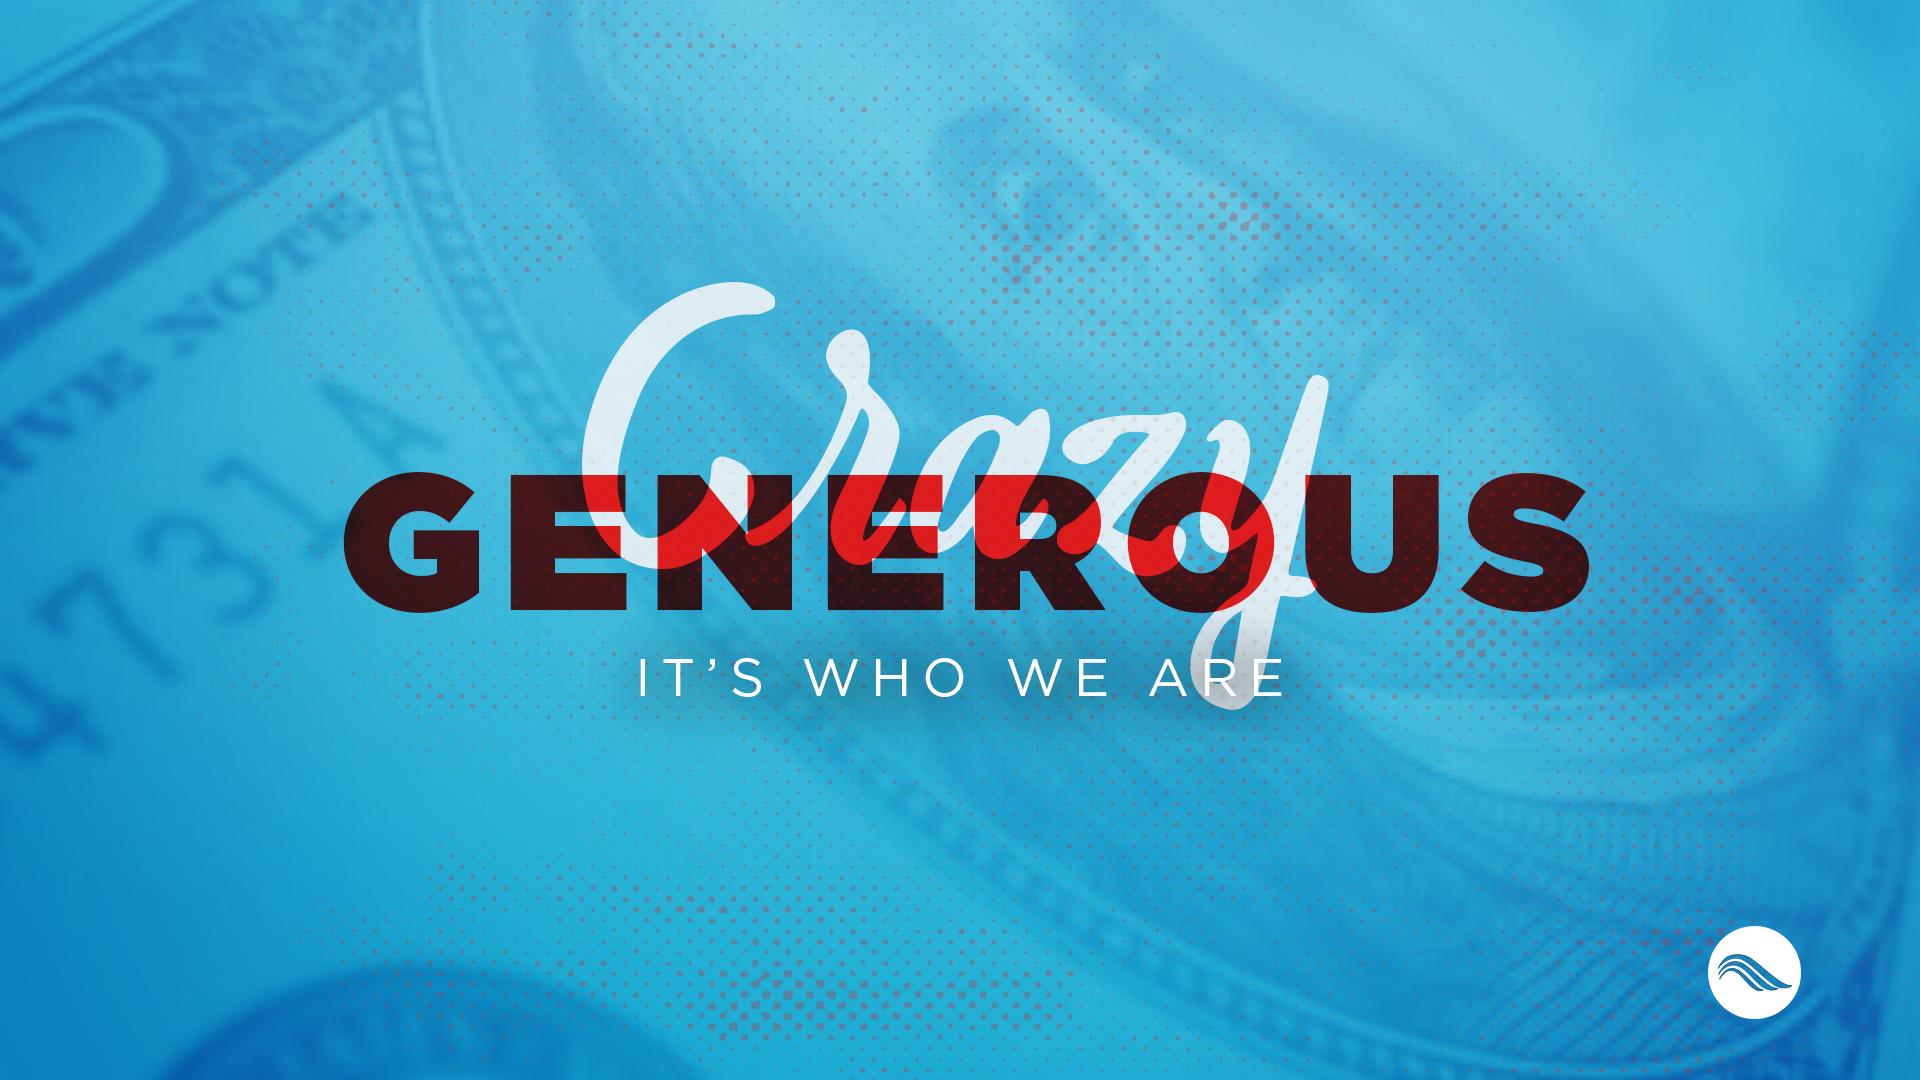 Crazy Generous_16x9 2.jpg